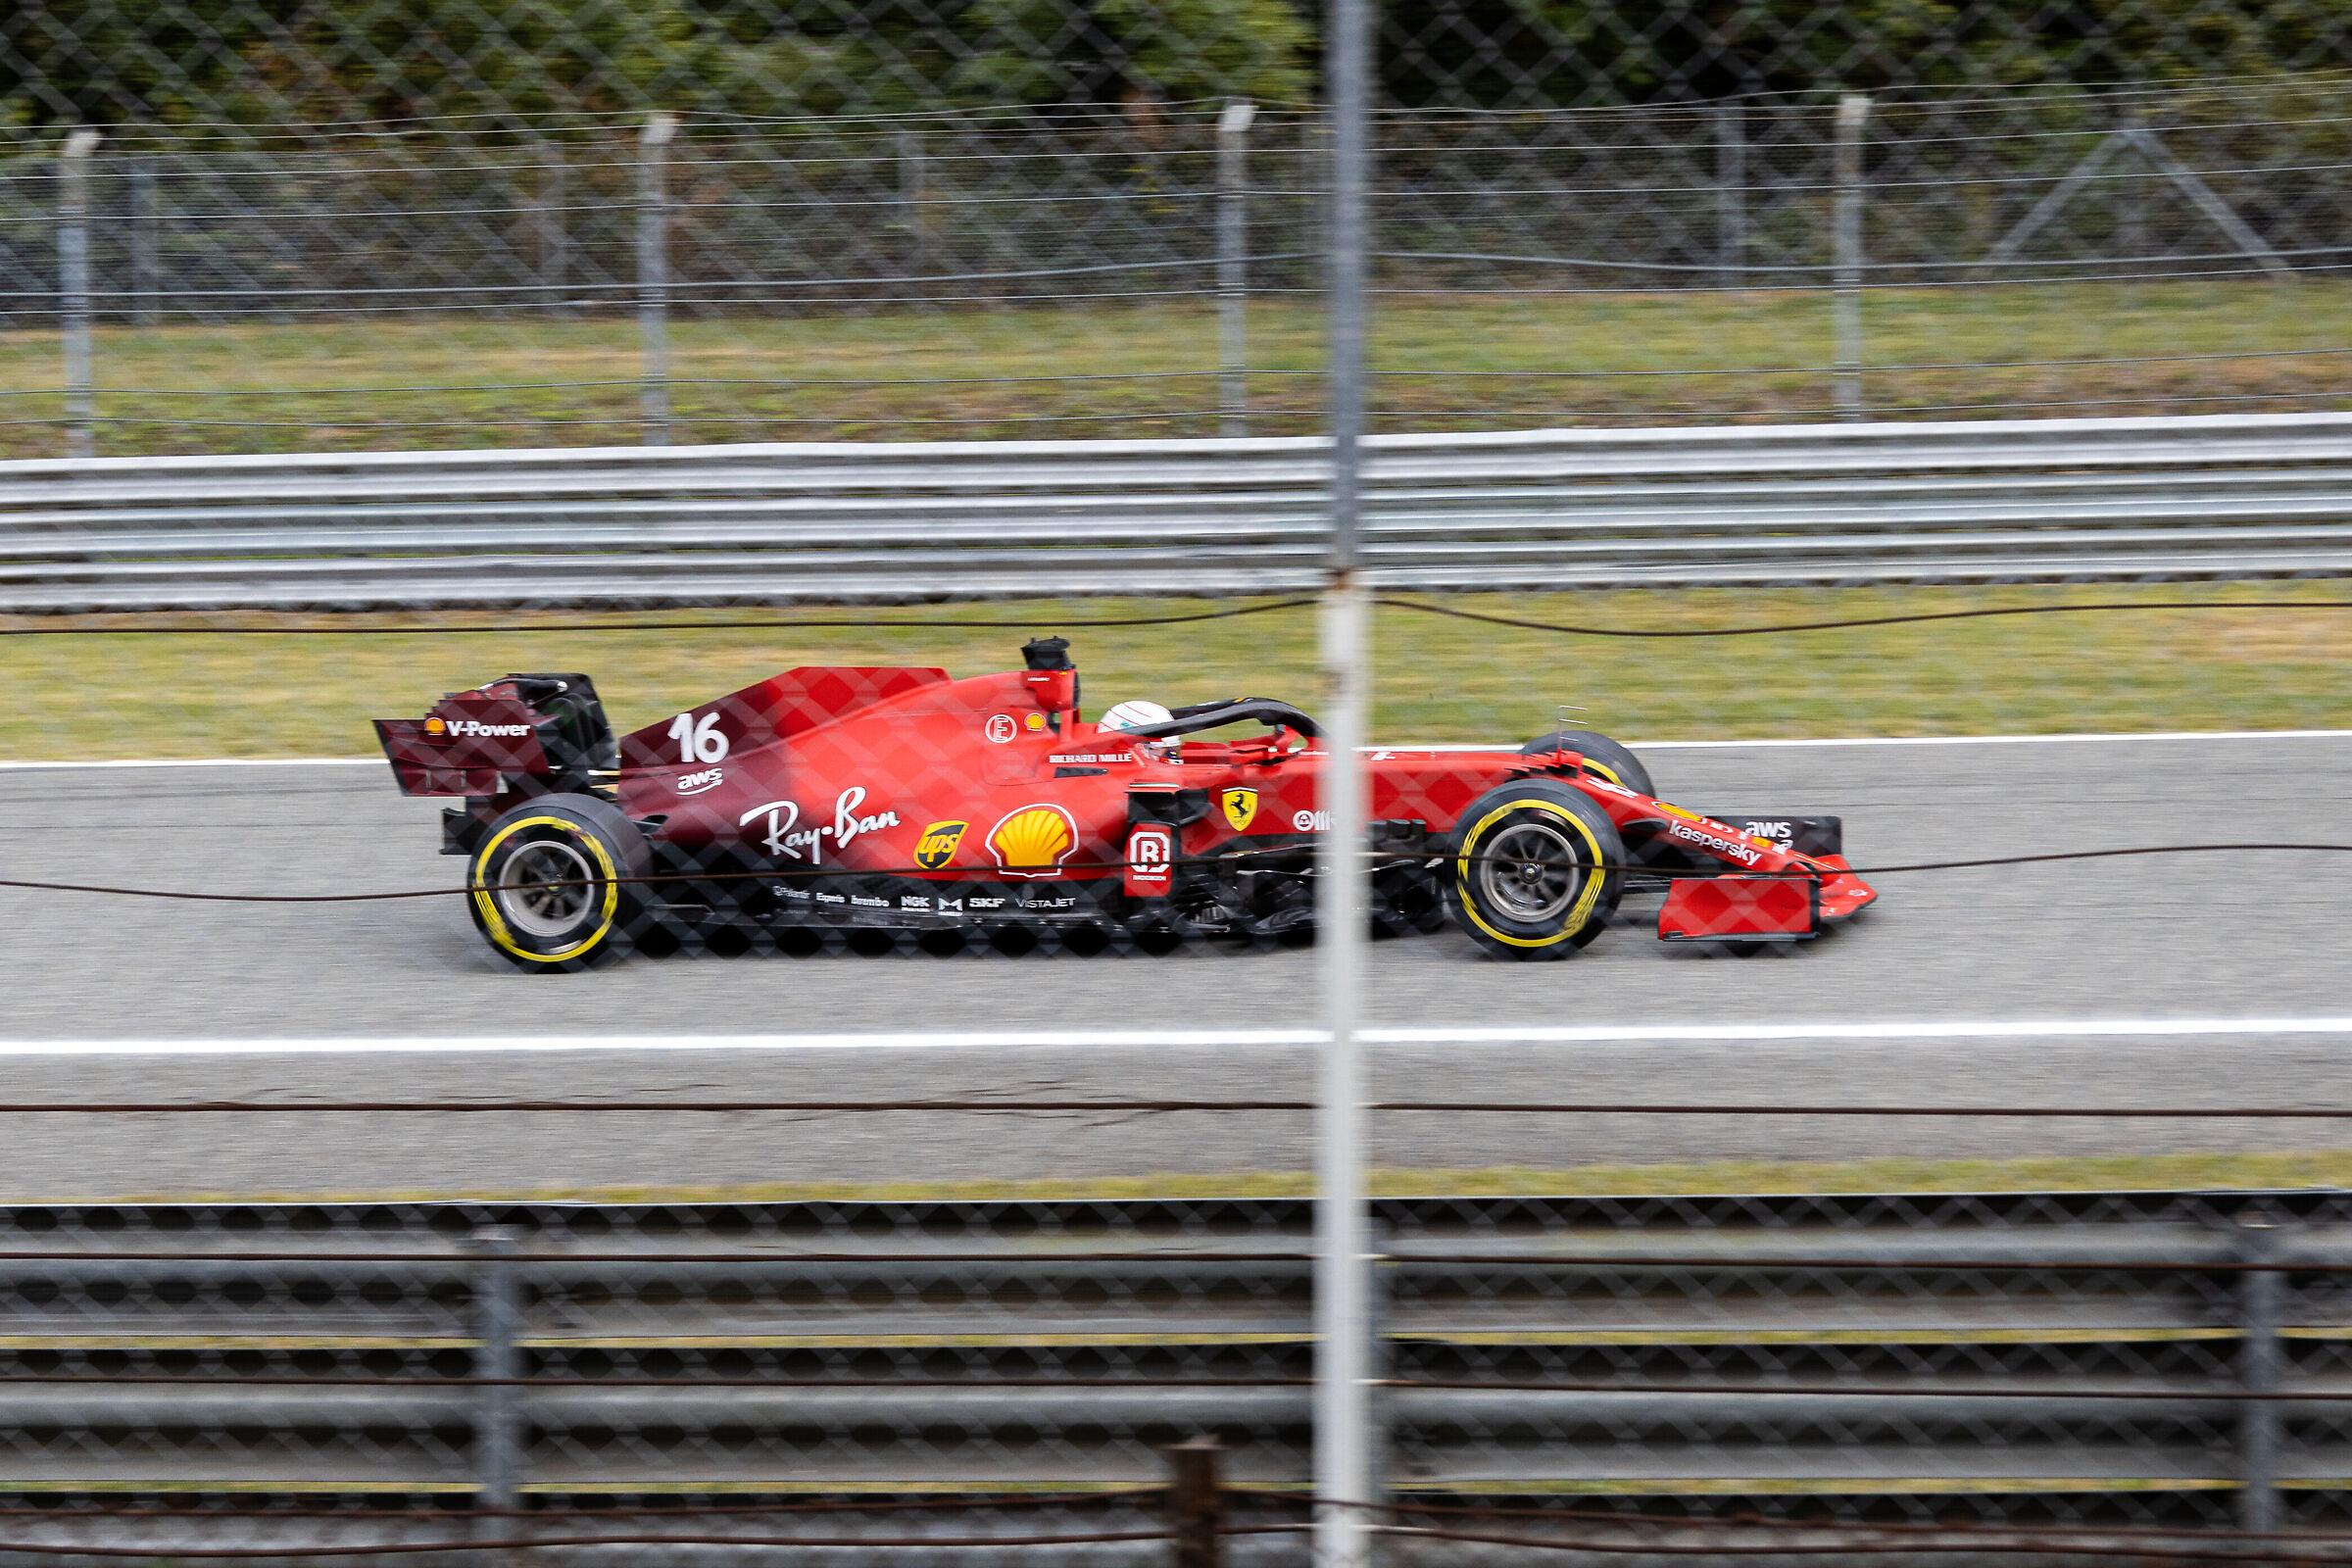 Charles Leclerc - Monza 2021...